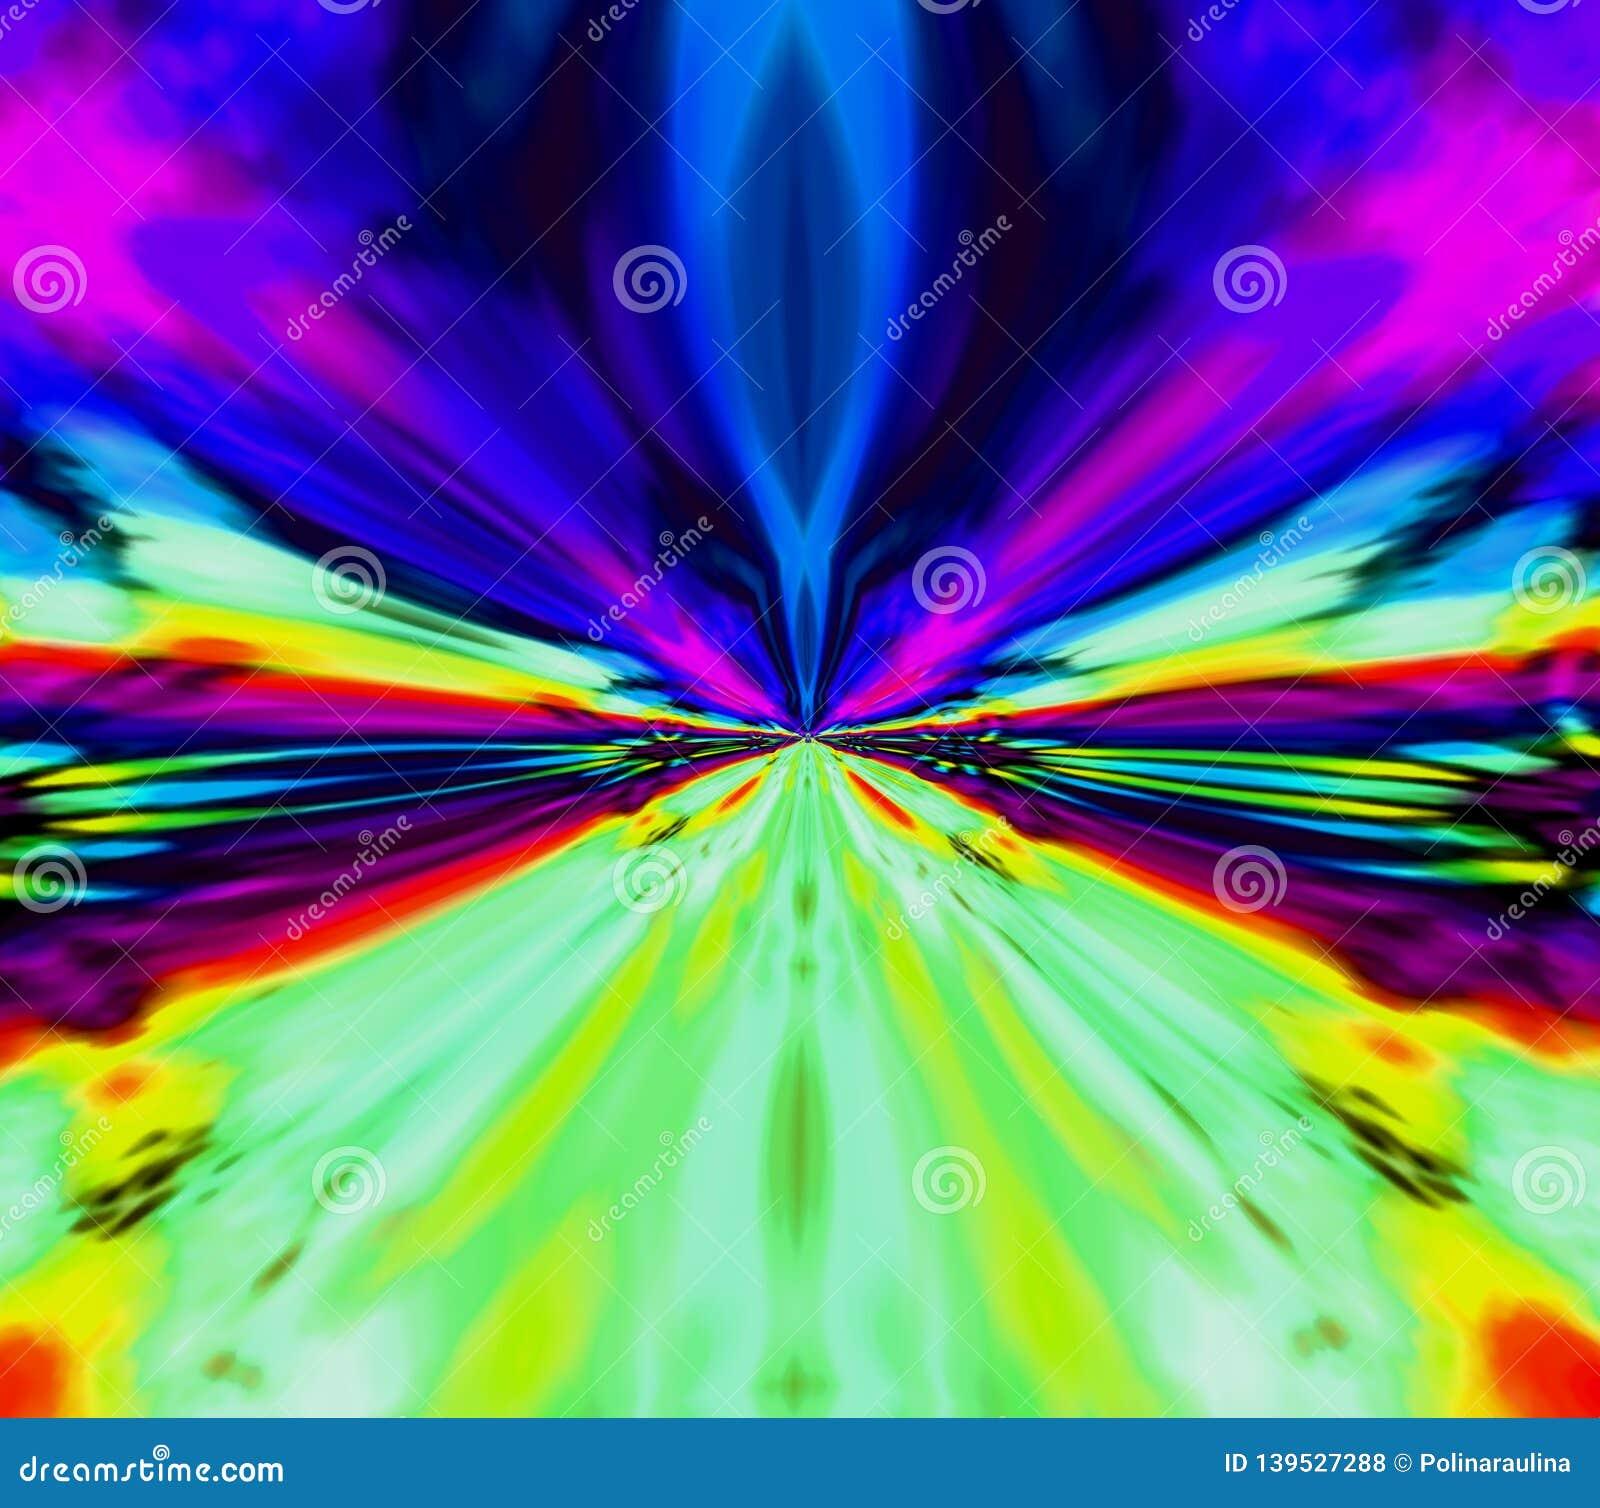 Tie Day Acid Rainbow Background.Canvas Print Stock